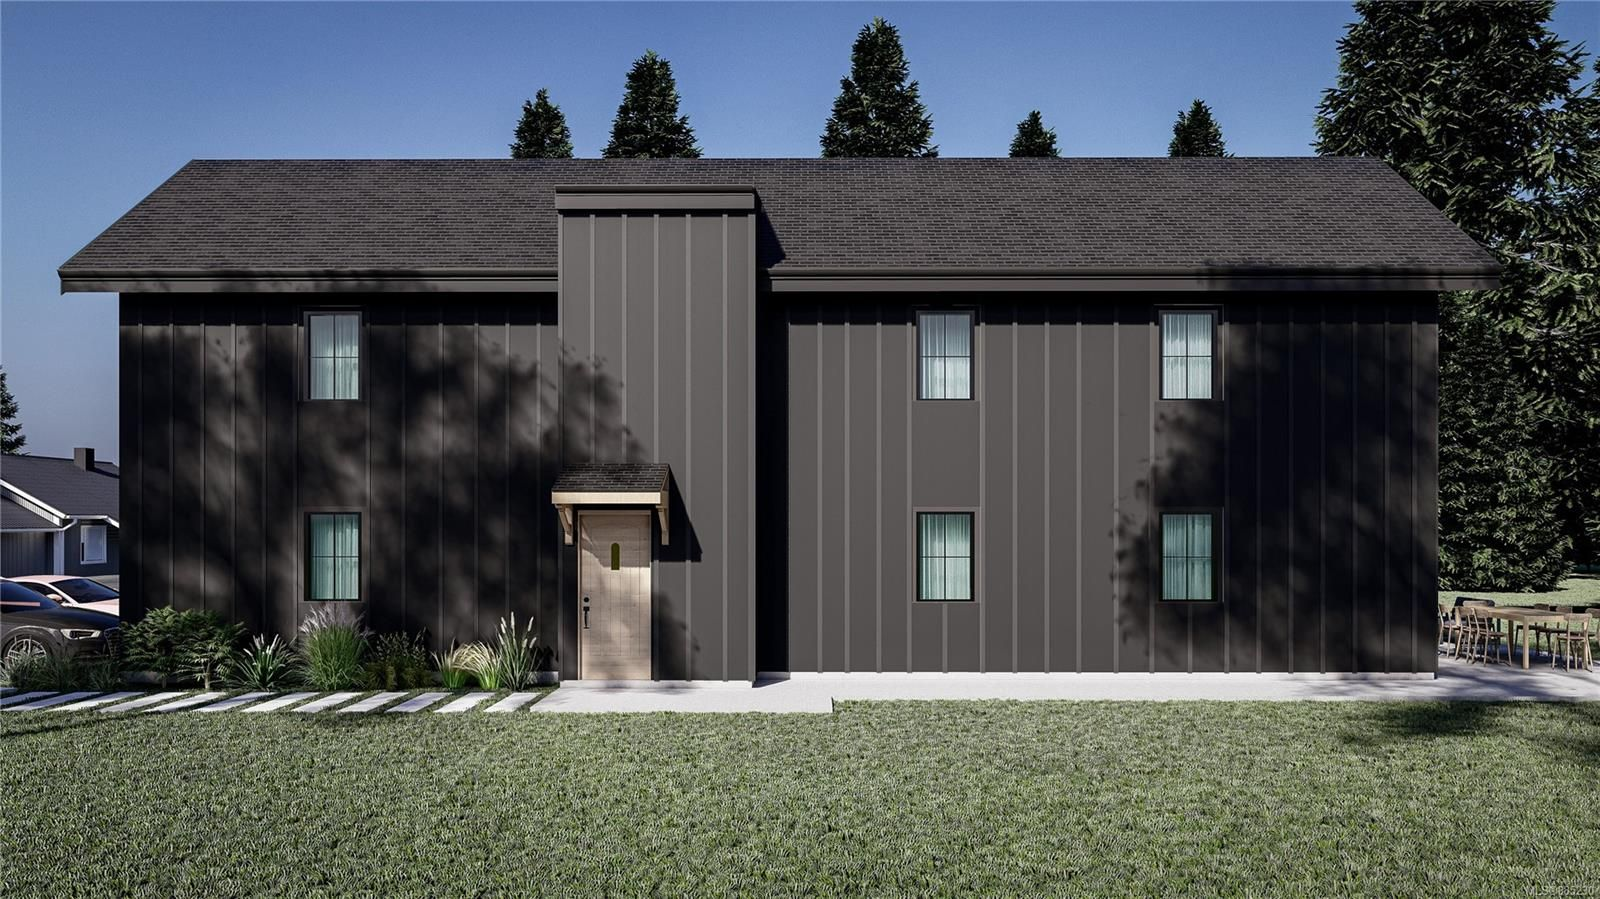 Main Photo: 1471 Tharratt Rd in : ML Shawnigan House for sale (Malahat & Area)  : MLS®# 885230